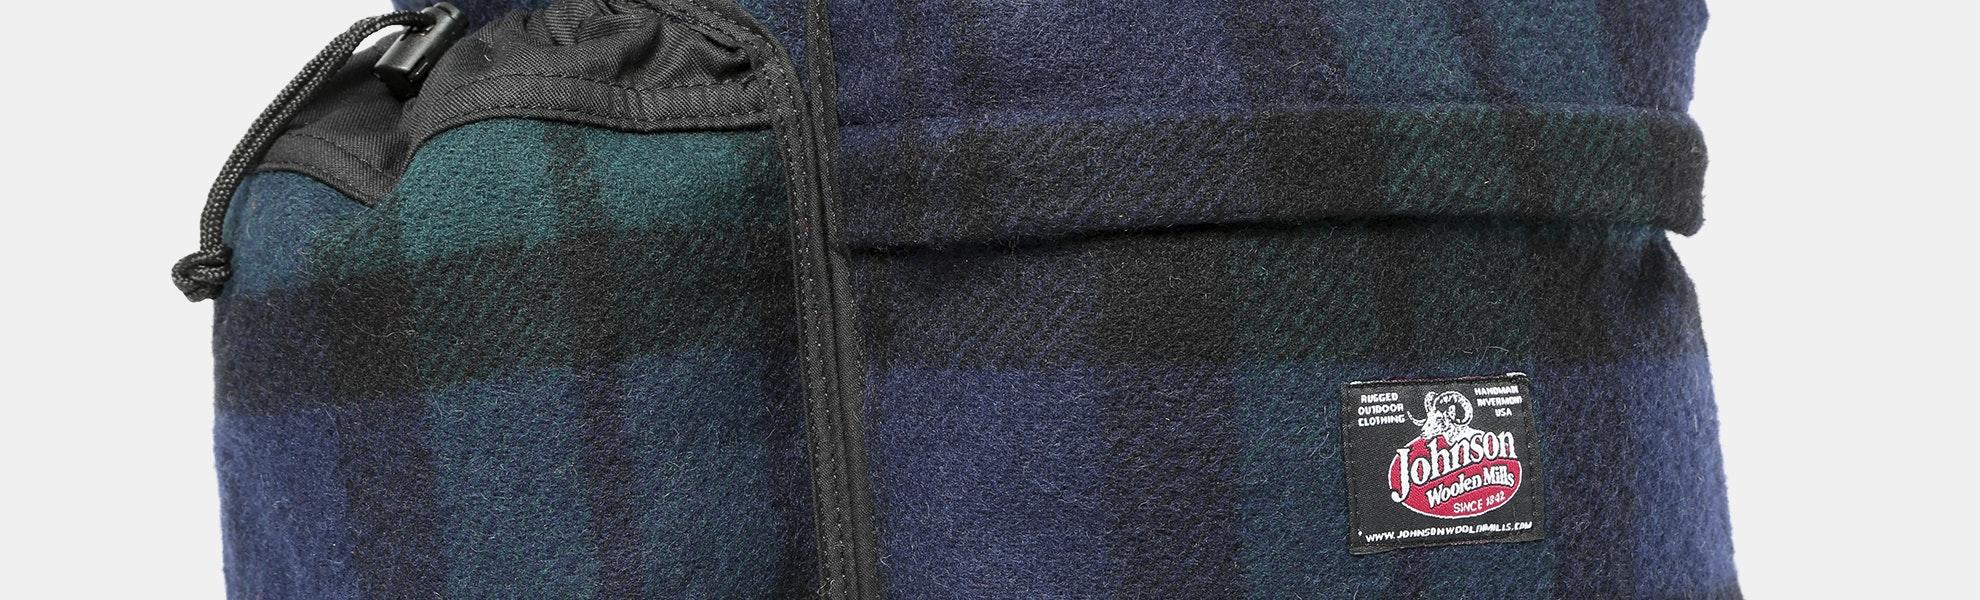 Johnson Woolen Mills Backpacks